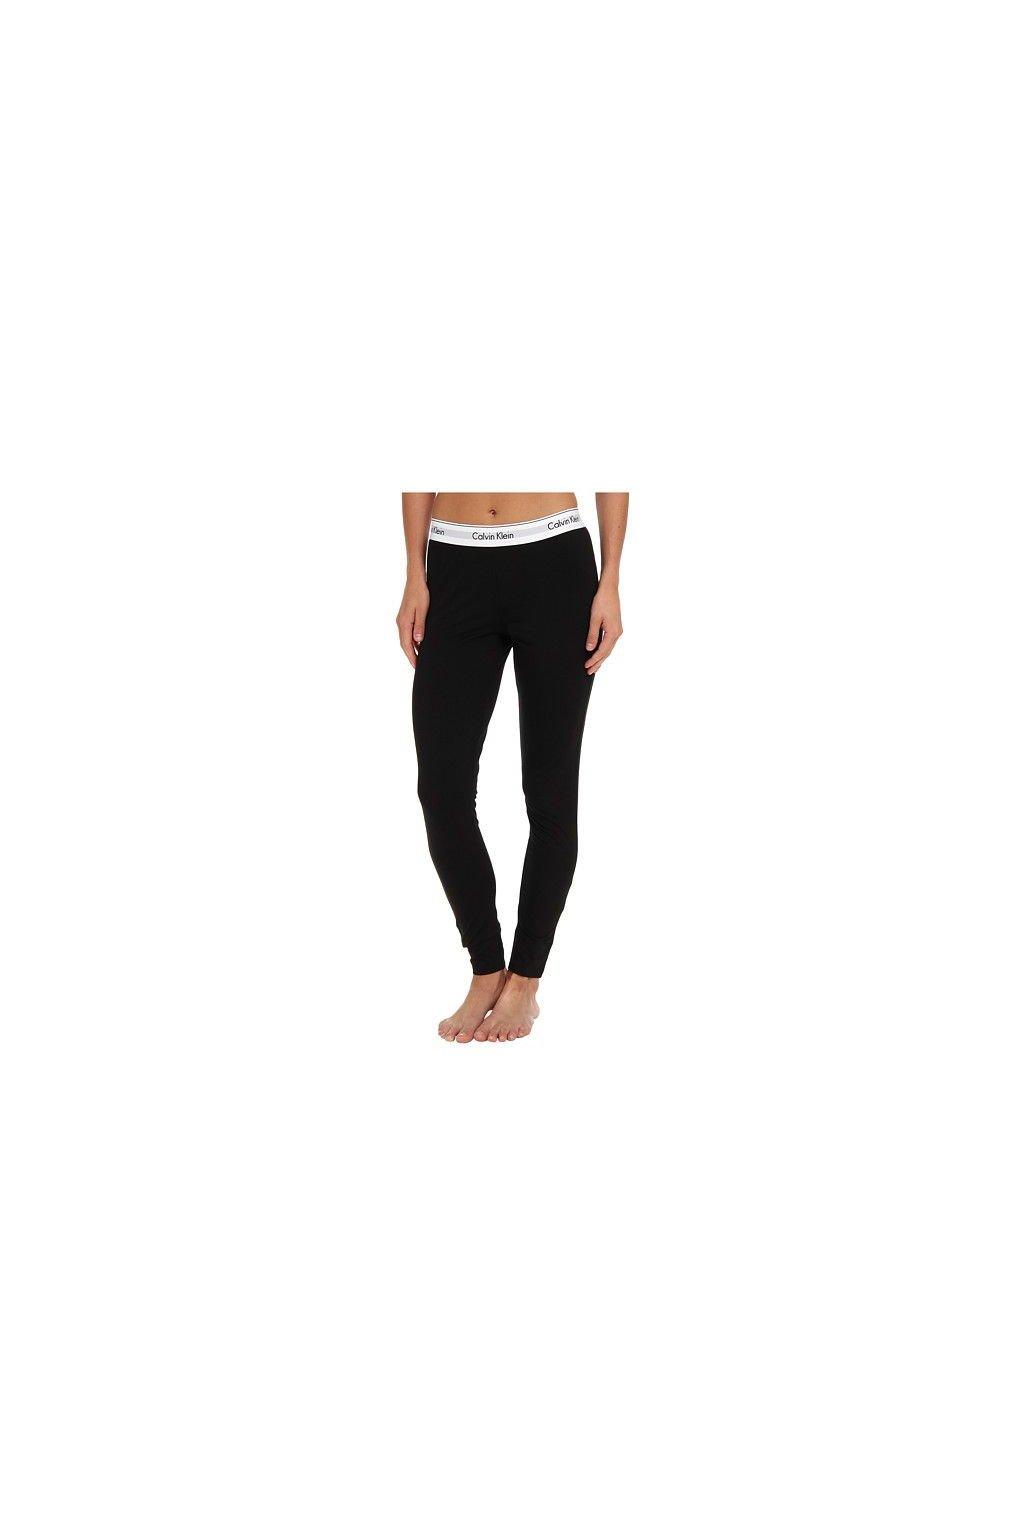 Calvin Klein Legíny černé